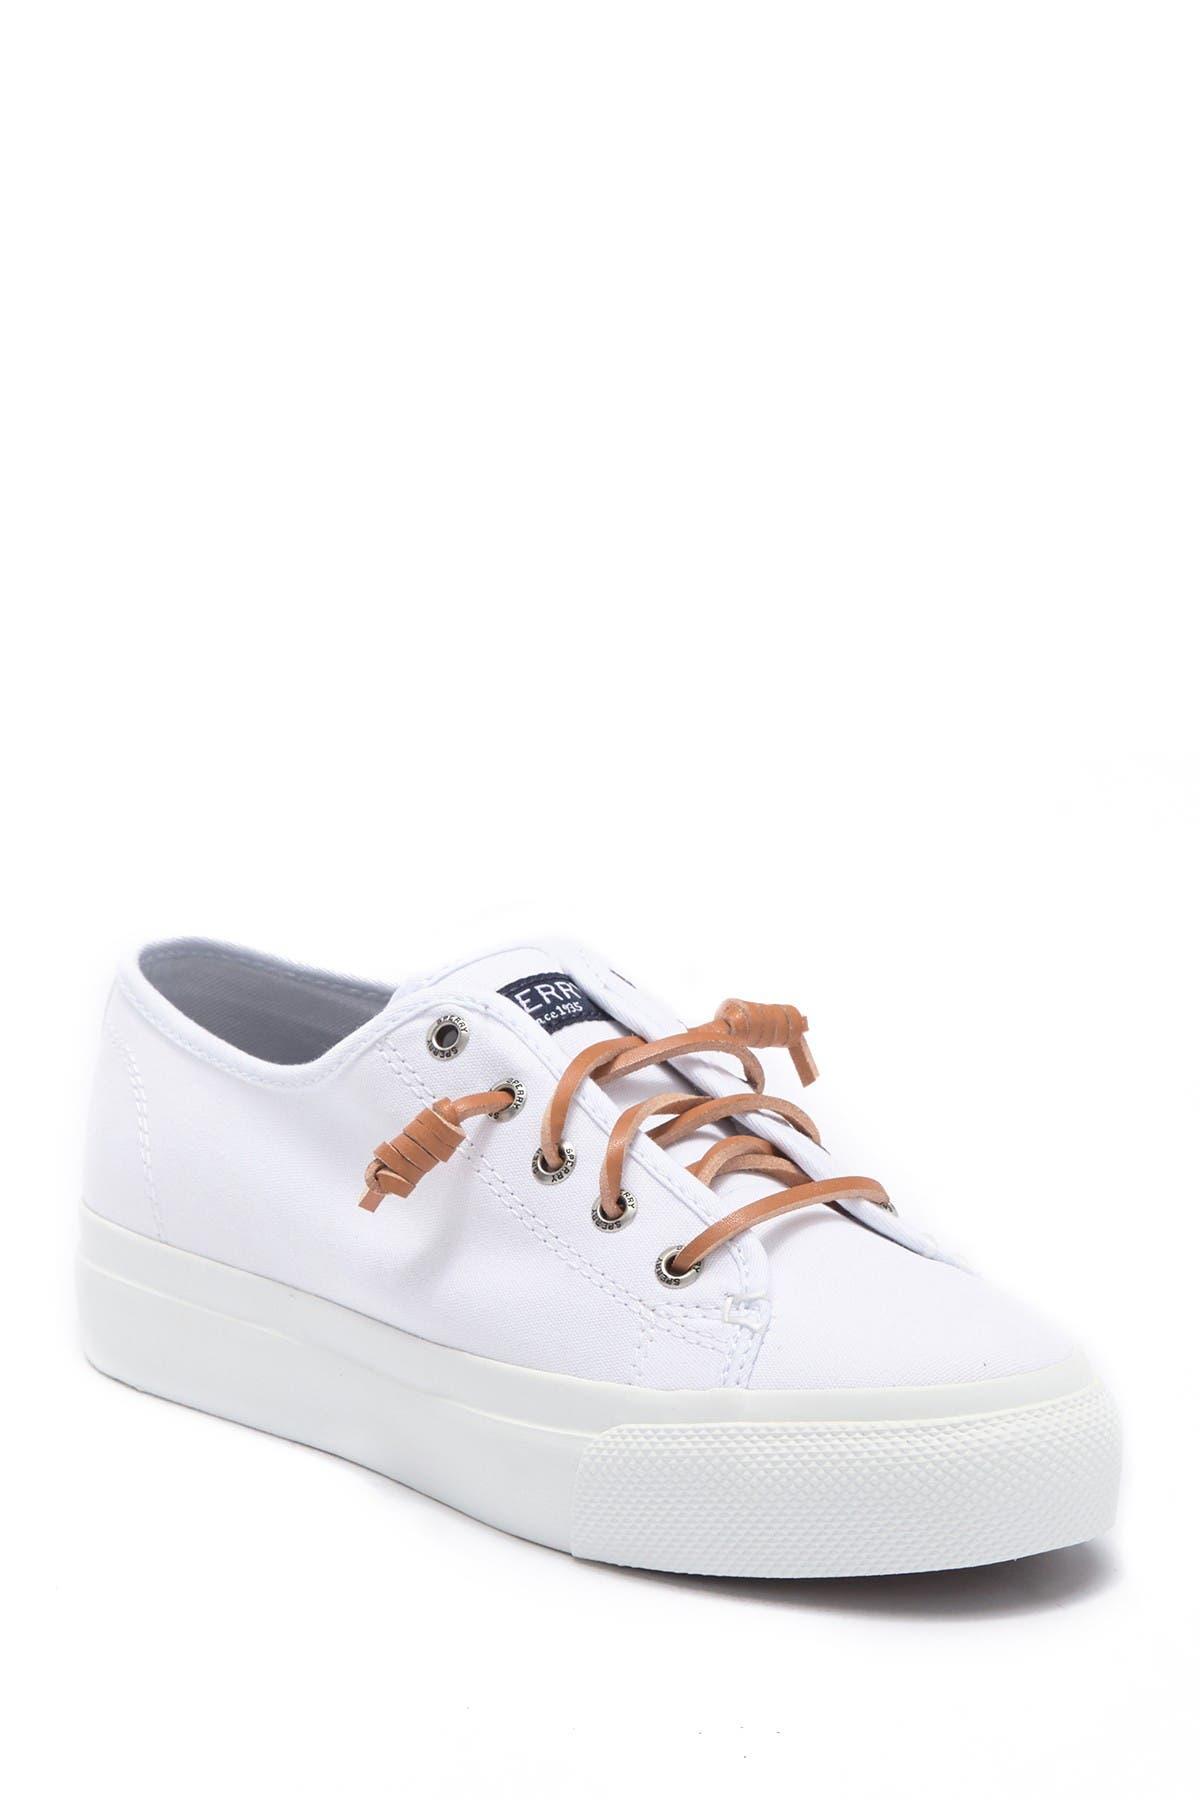 Sperry   Cliffside Platform Sneaker